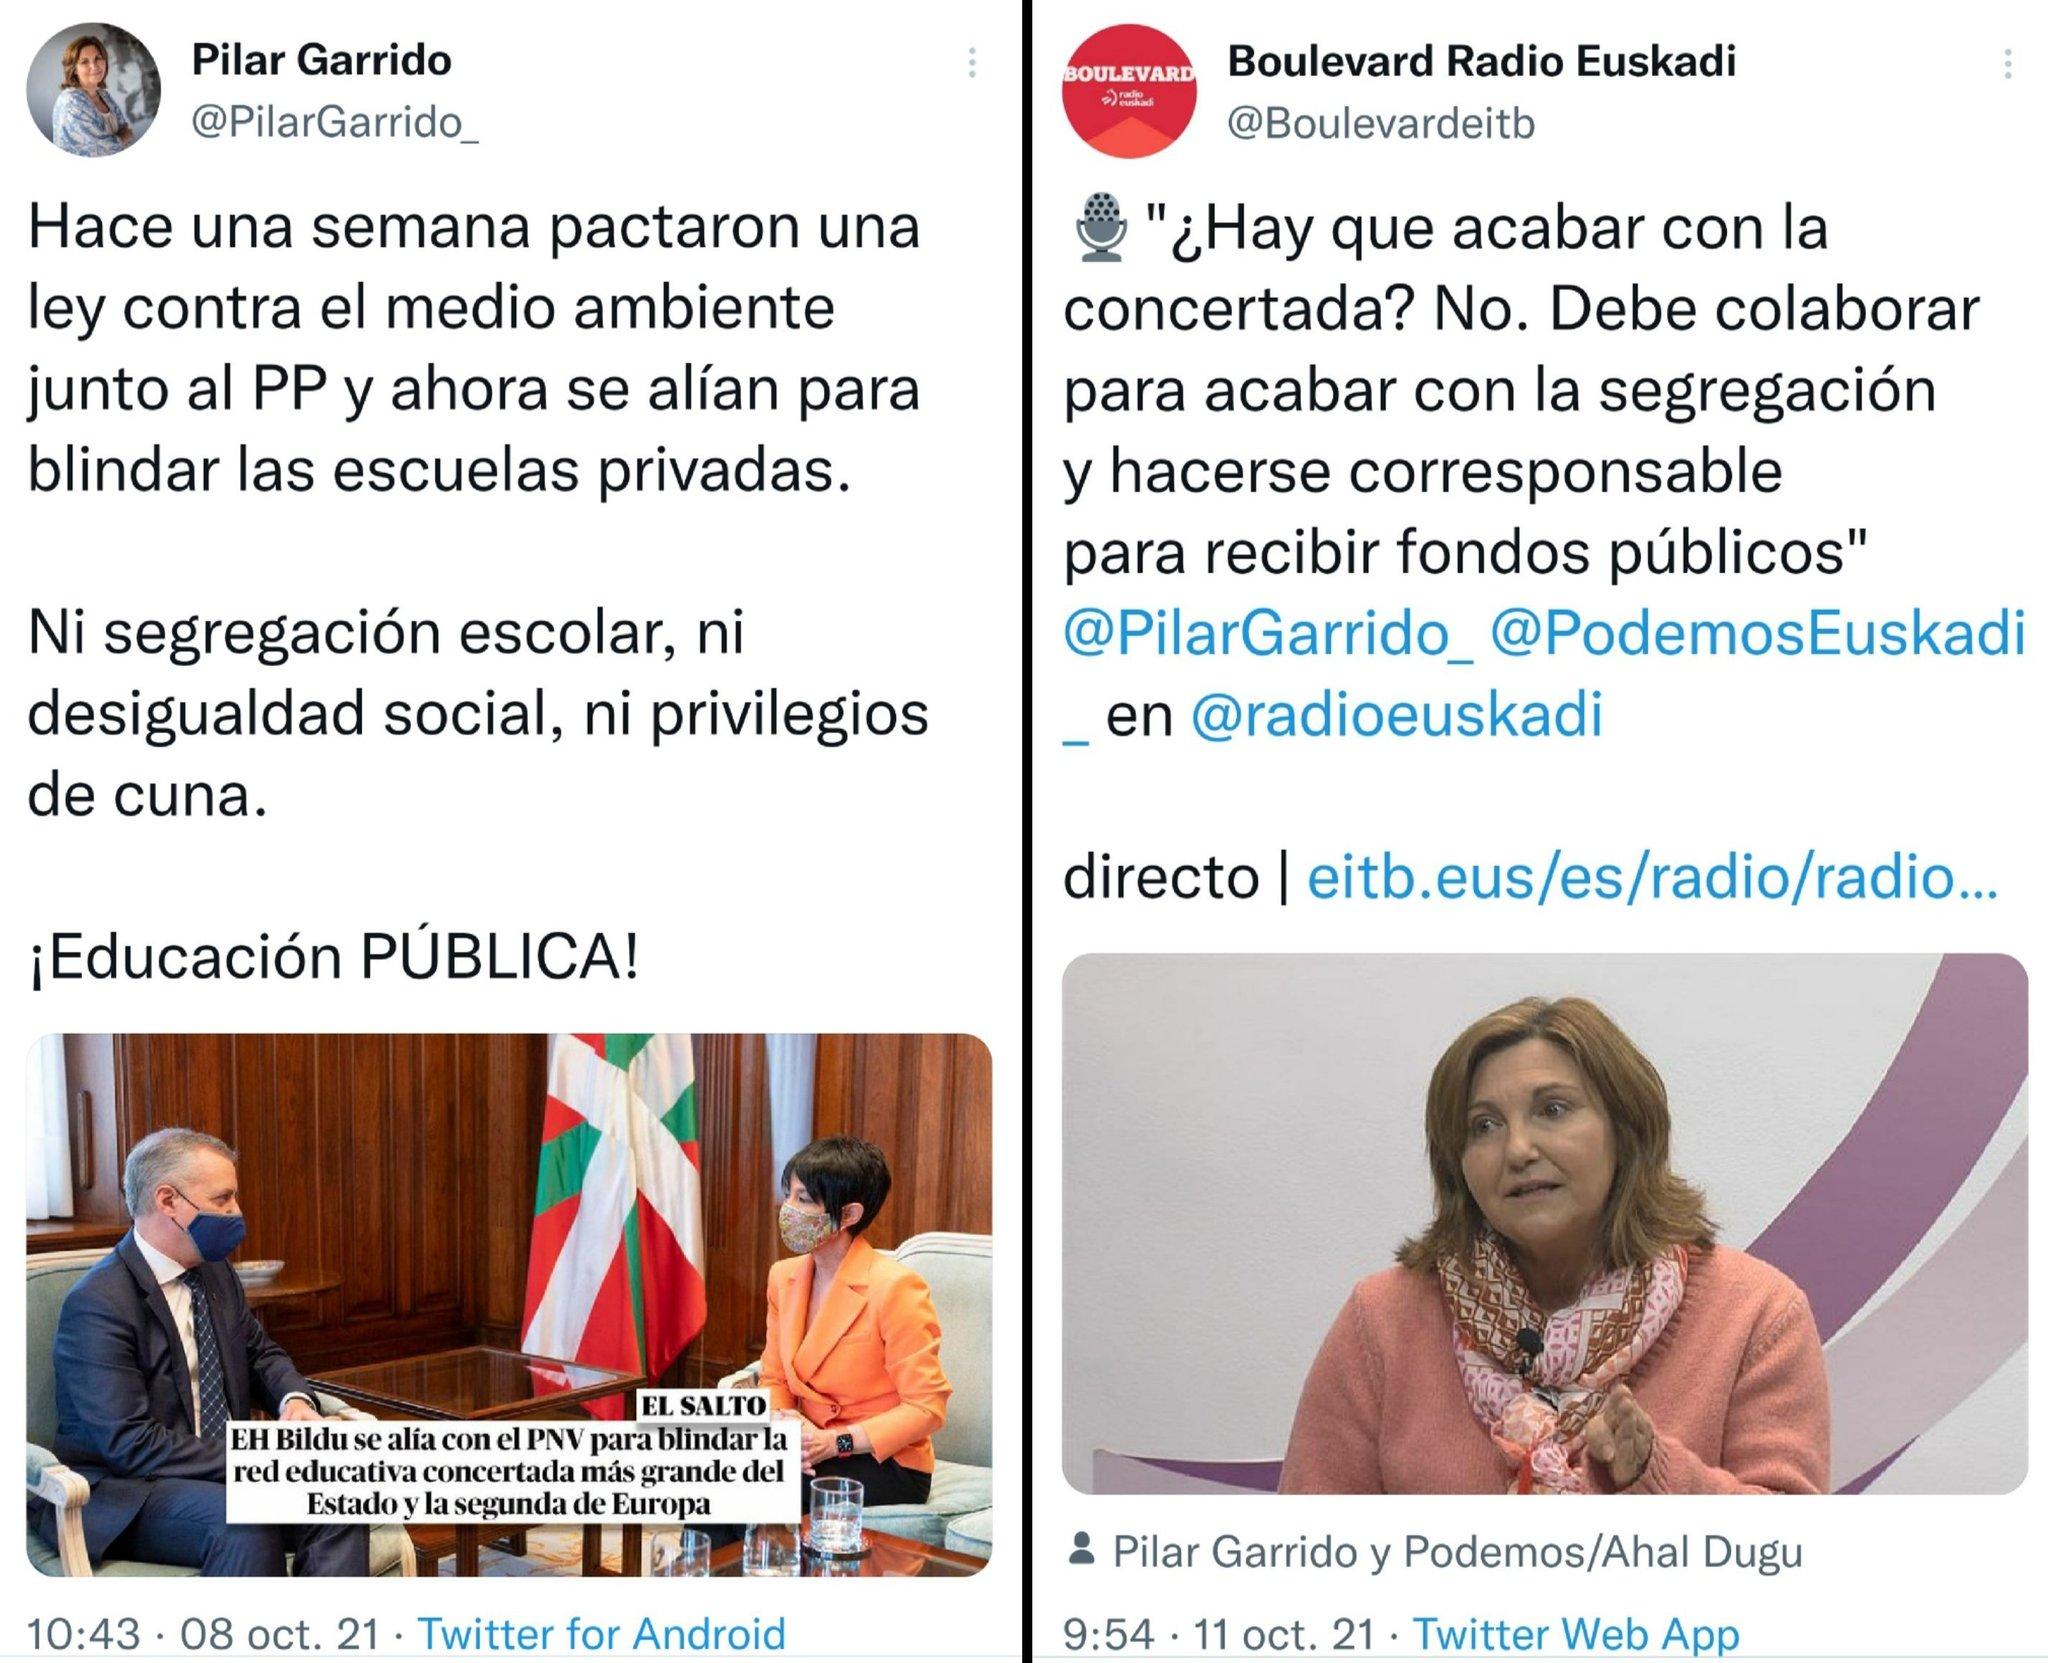 LA PELOTA VASCA - Página 3 FBaPY-sWUAYTMnM?format=jpg&name=large